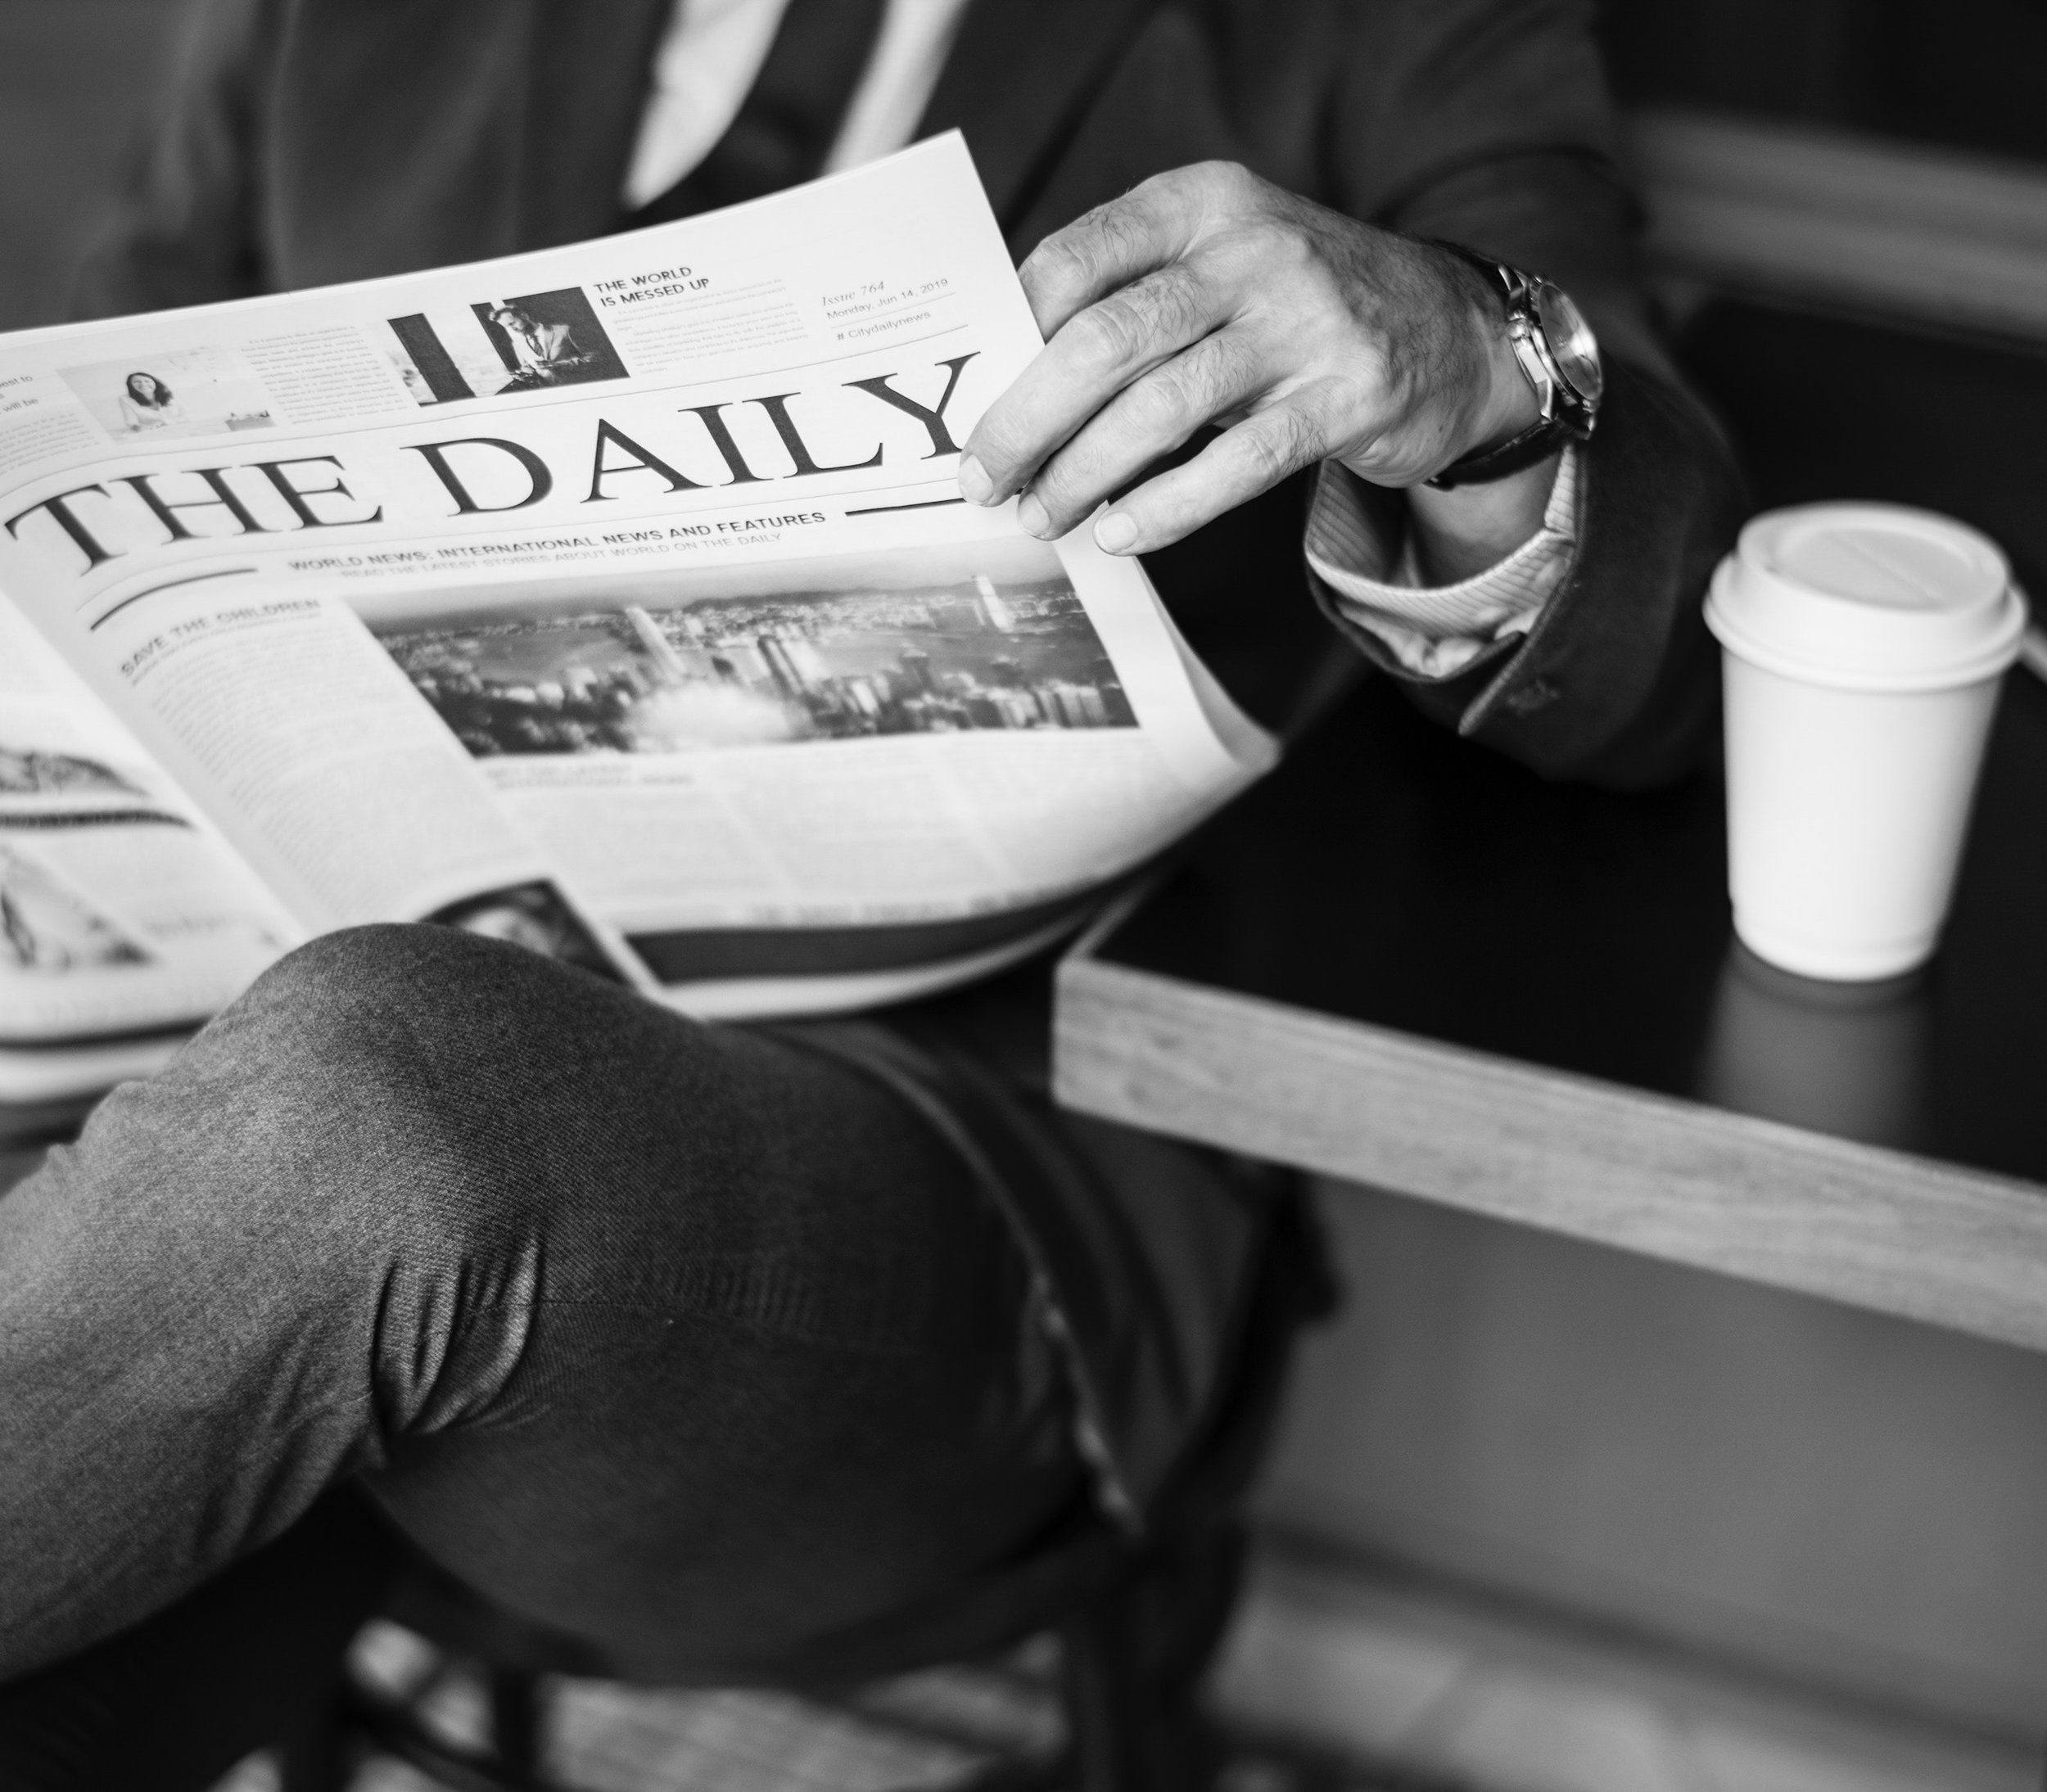 man reads newspaper on bench